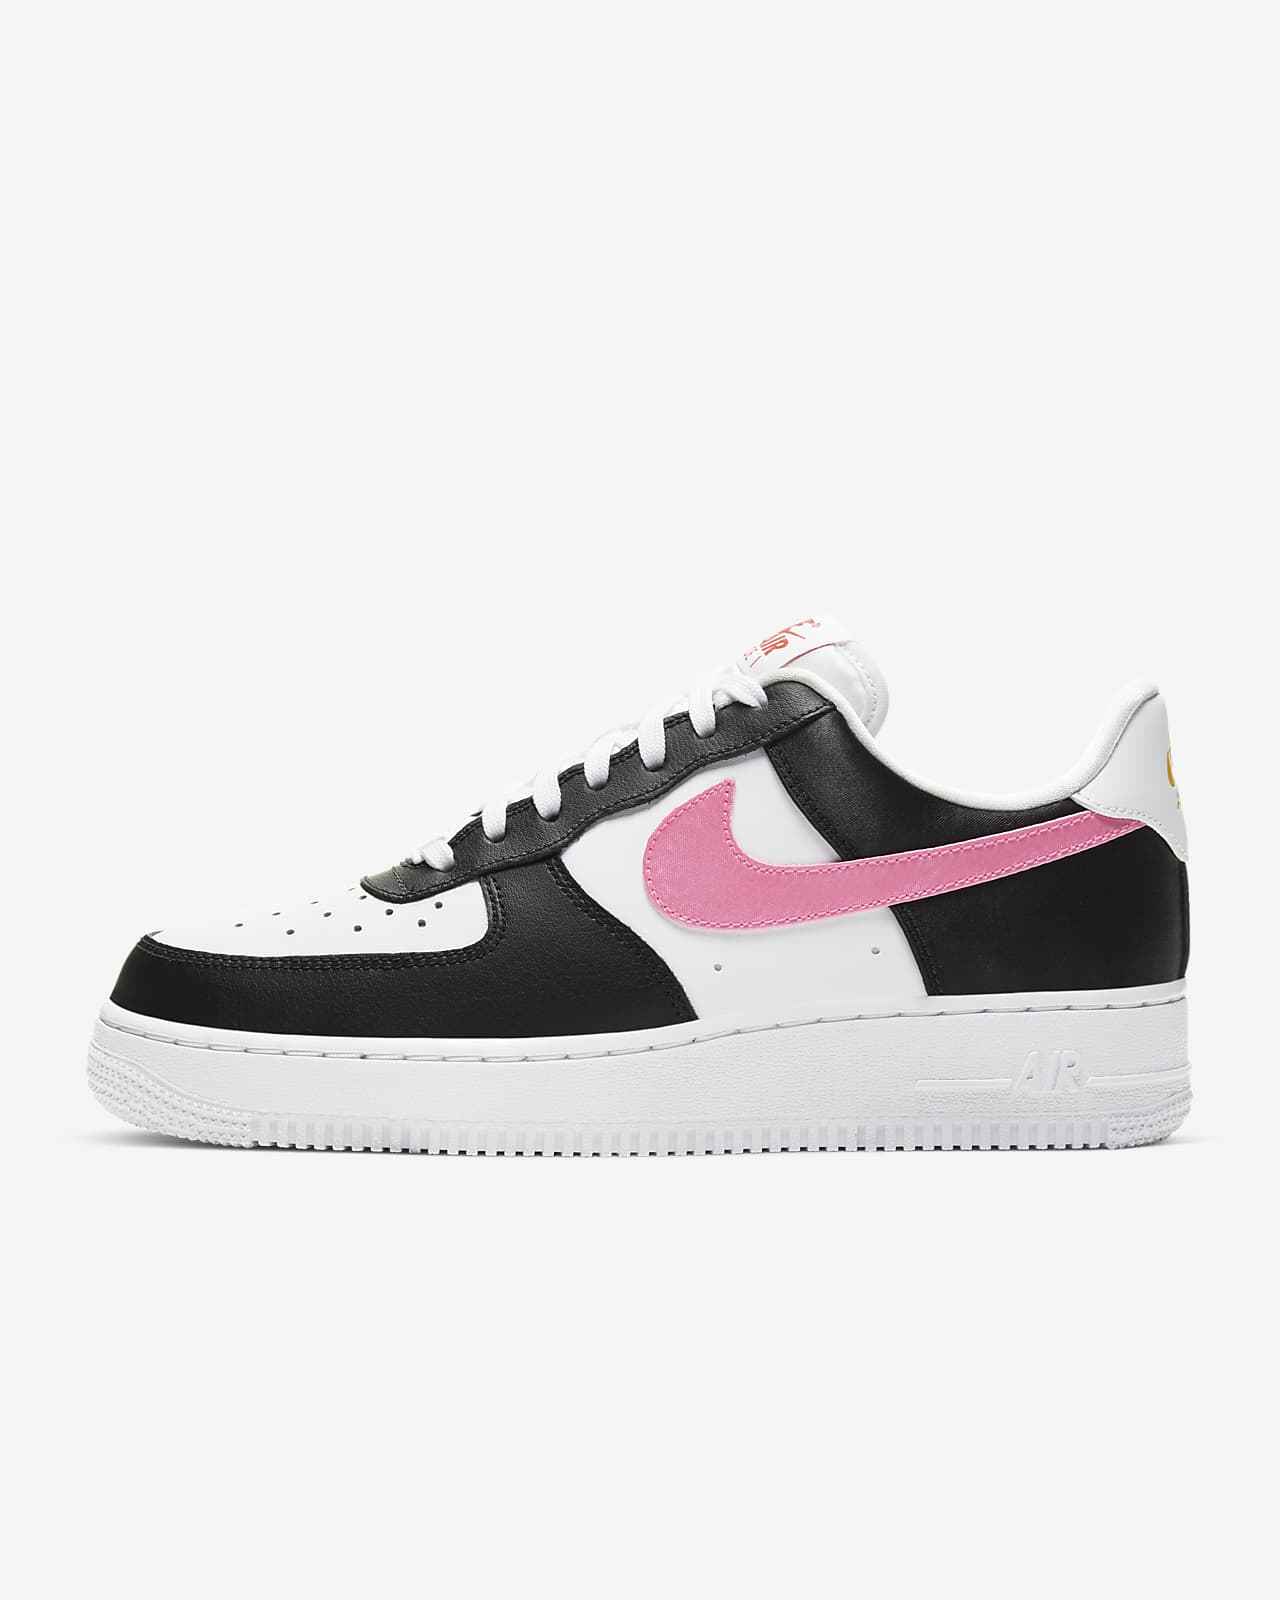 chaussure femme nike air force 1 jordan